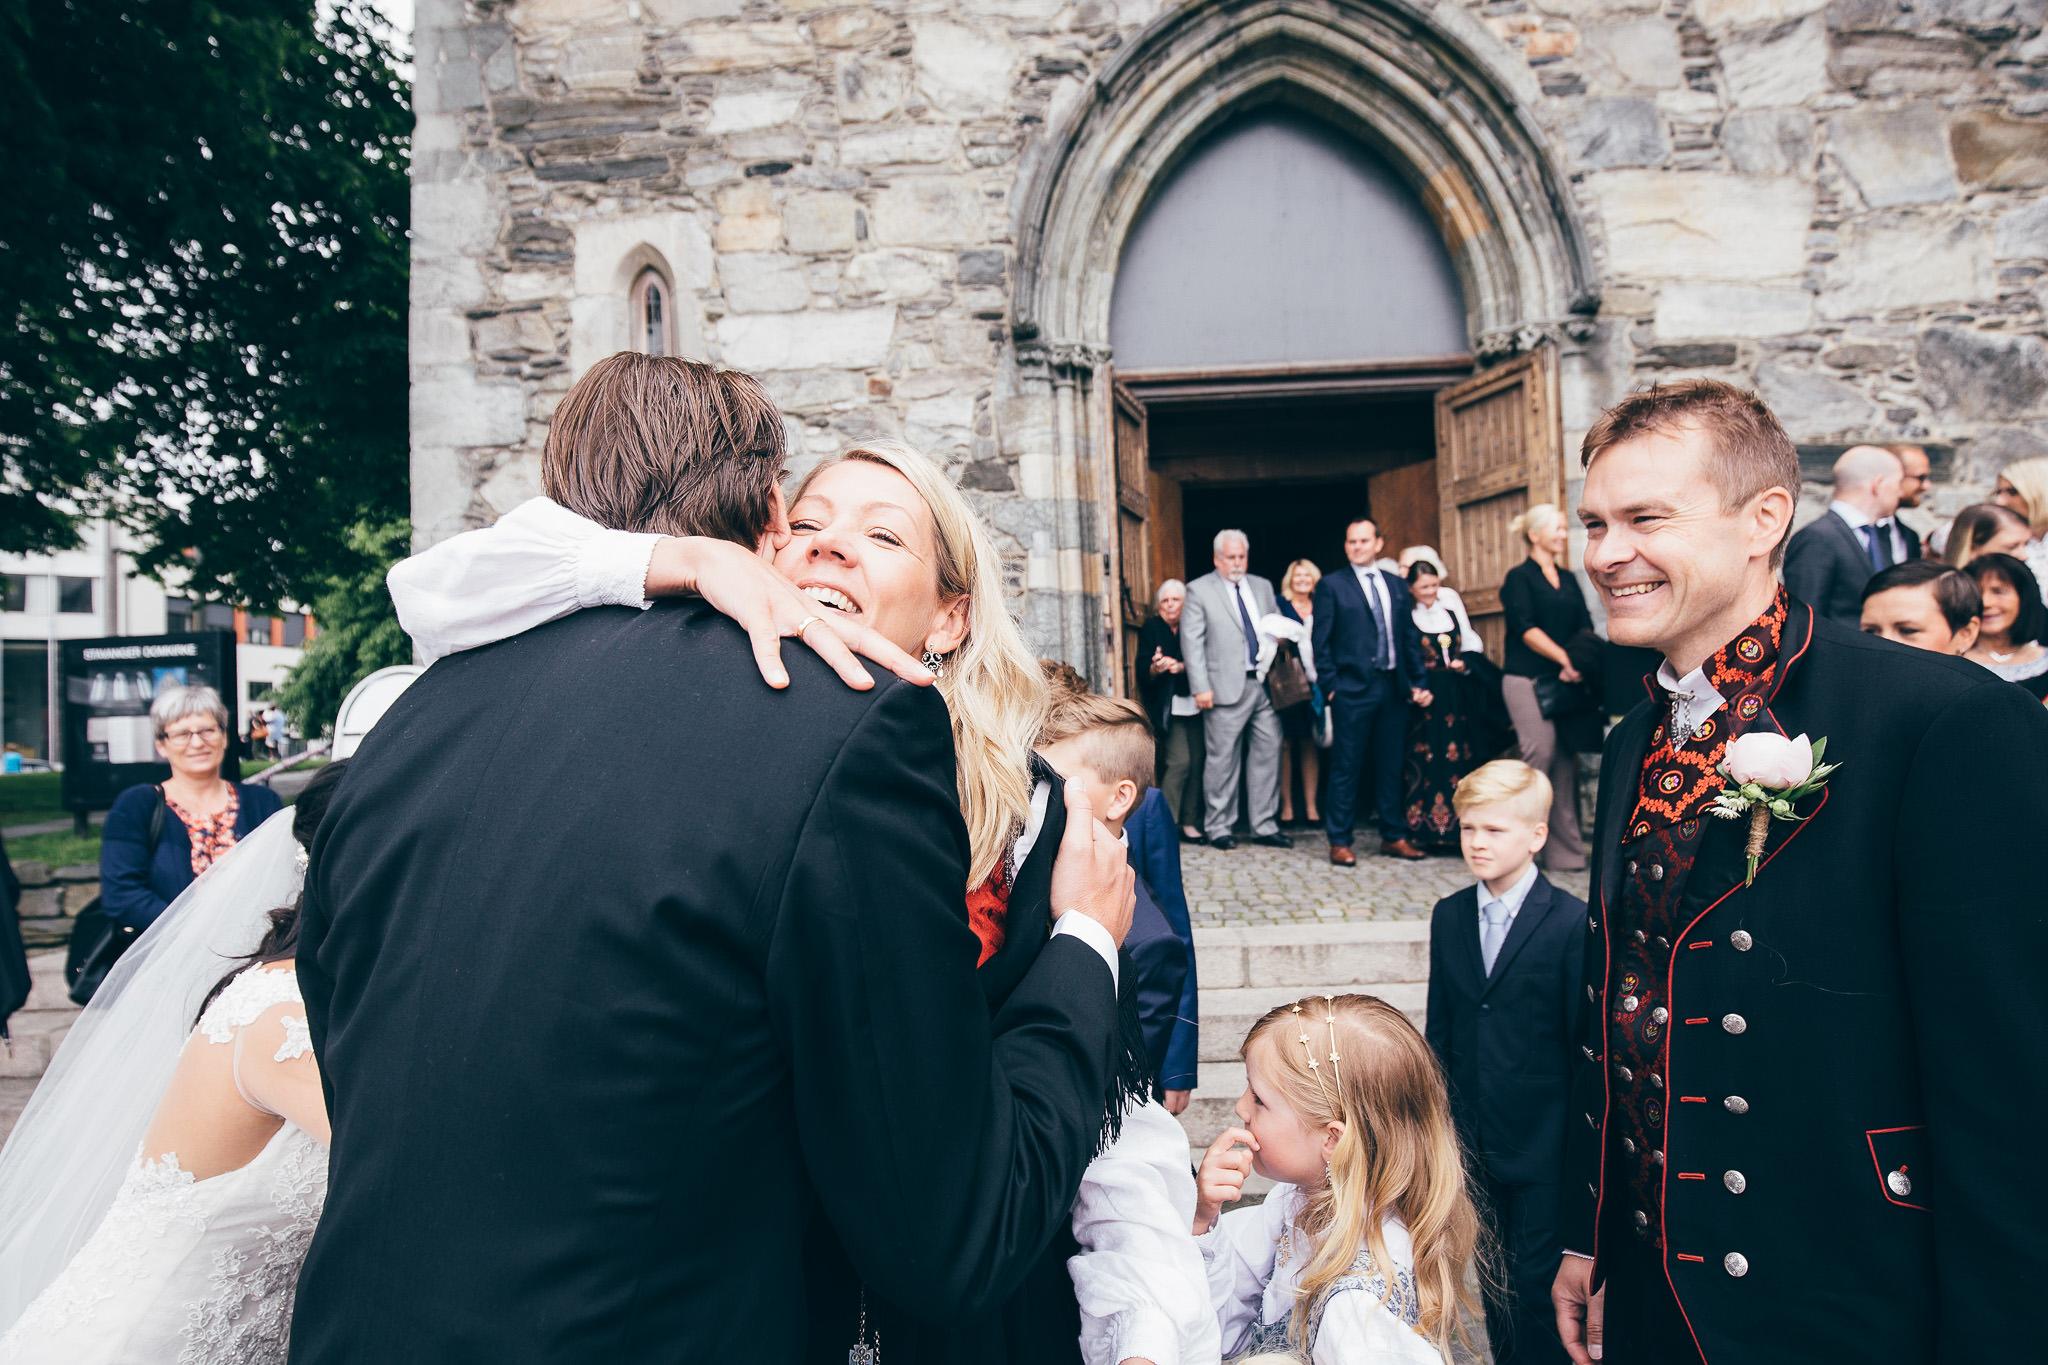 Wedding+Photographer+Norway+Bryllupsfotograf+Casey+Arneson+MK-141.jpg